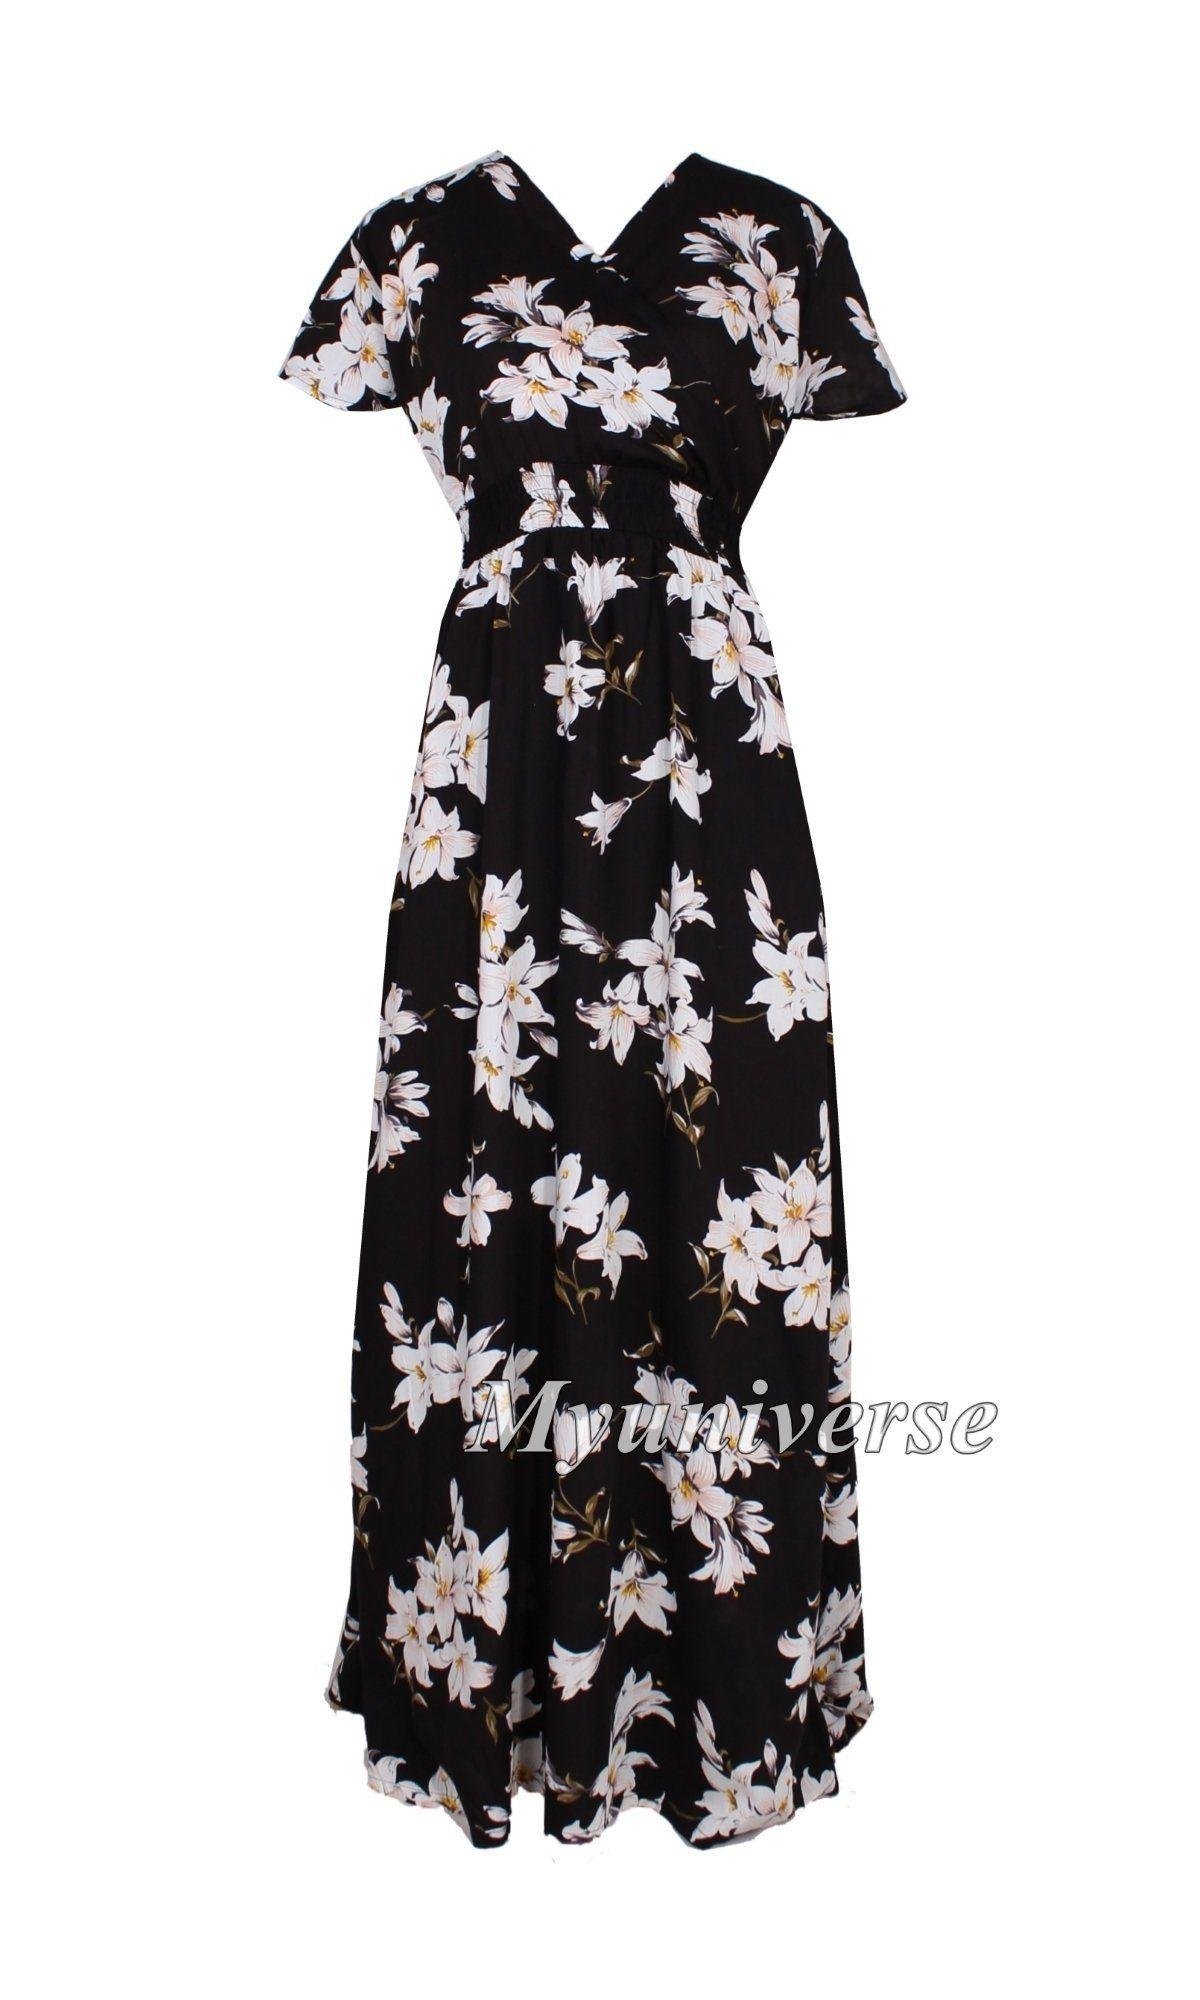 Summer Dress Party Dress Maxi Dress Full Length Long V Neck Sundress Plus Size Clothing Beach African Floral Summer Dresses Maxi Dress Party Summer Party Dress [ 2000 x 1200 Pixel ]